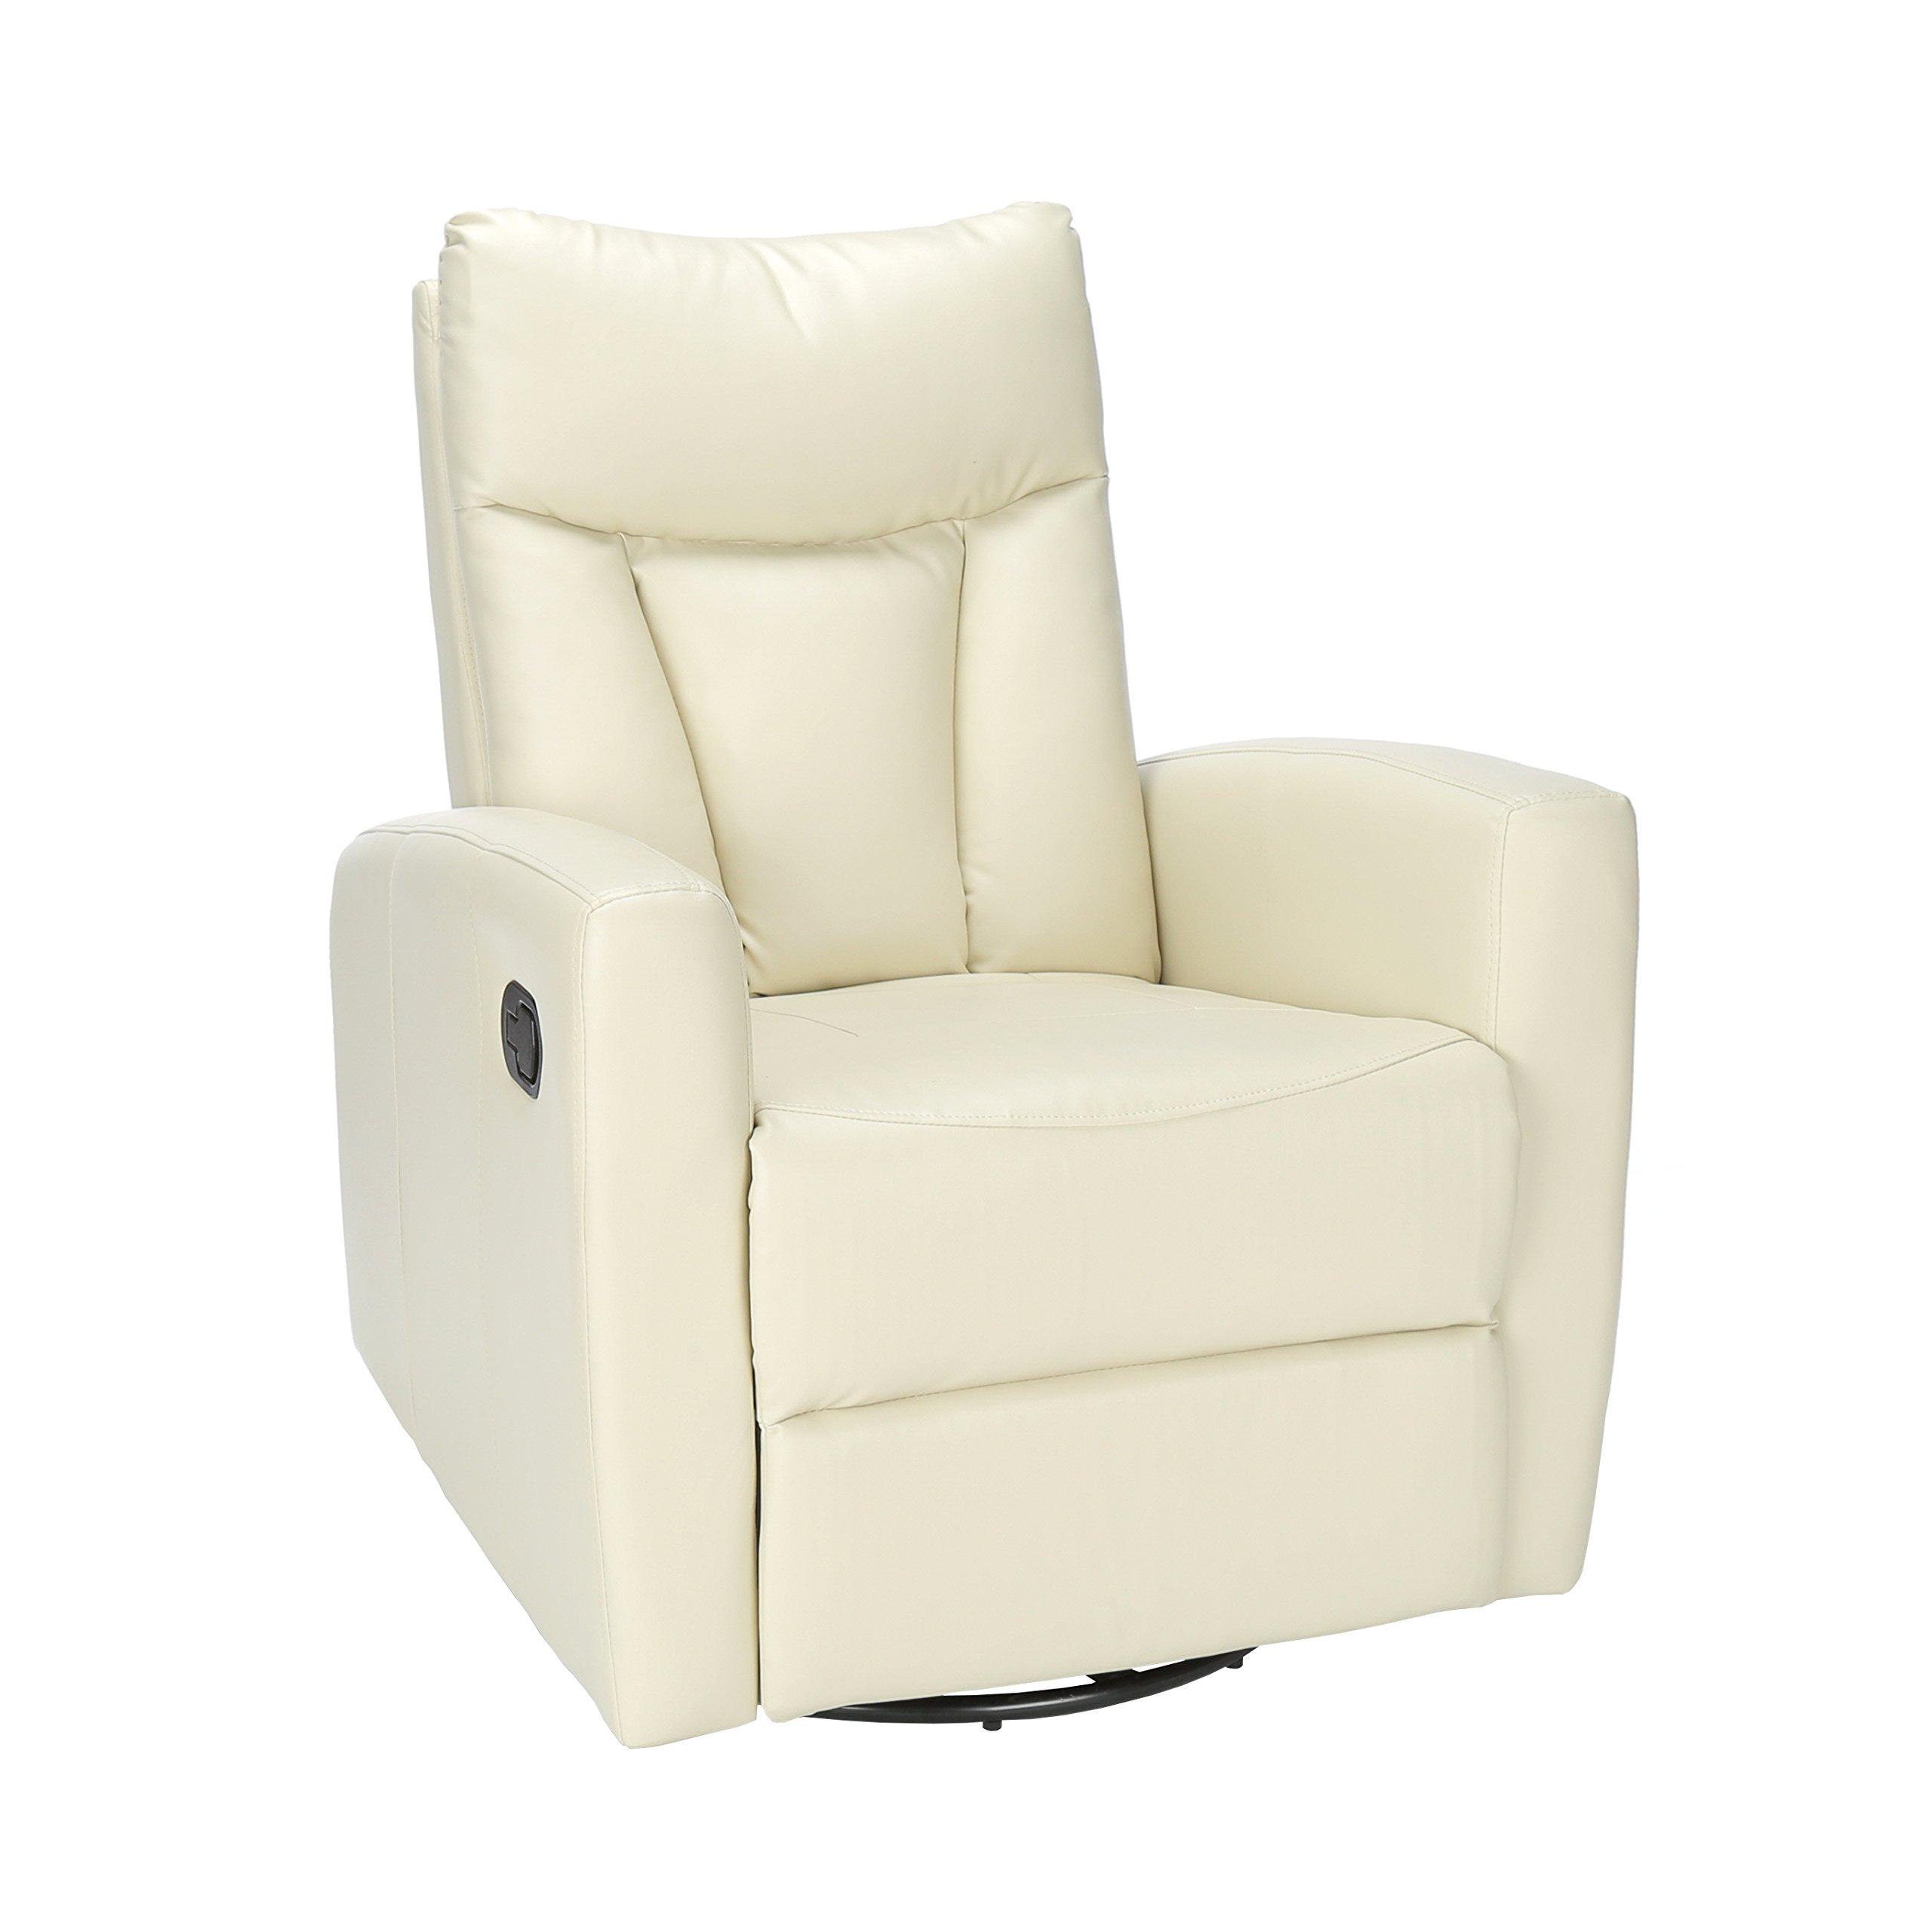 Recliner Rocker And Swivel Reclining Chair Living Room